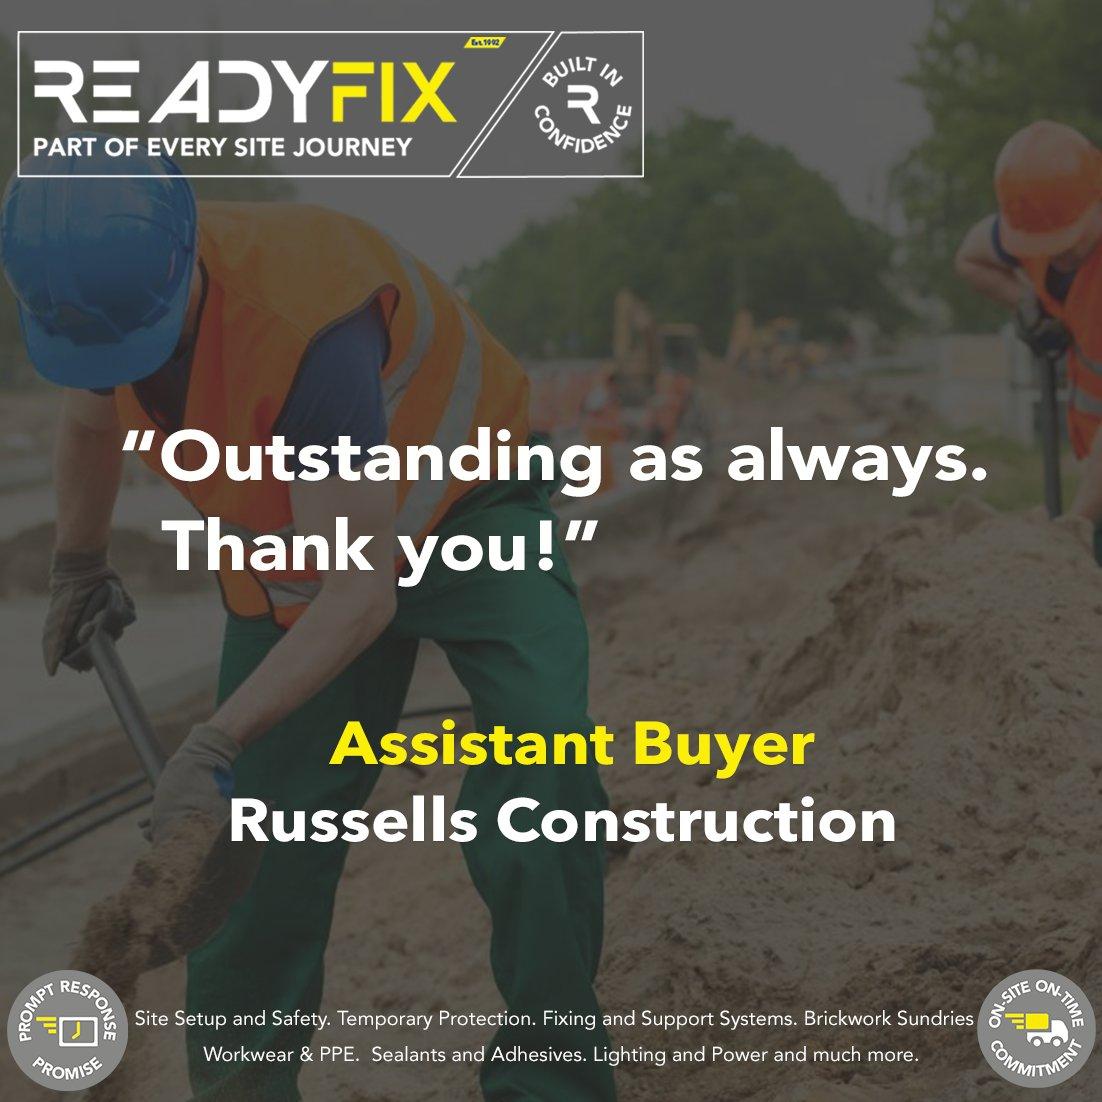 Readyfix, part of every site journey.  http://bit.ly/Readyfix  #construction #winter #sitemanagers #tradespeople #constructionuk #meettheteam #brand #northwest #readyfixpic.twitter.com/1BJGB8UCtE